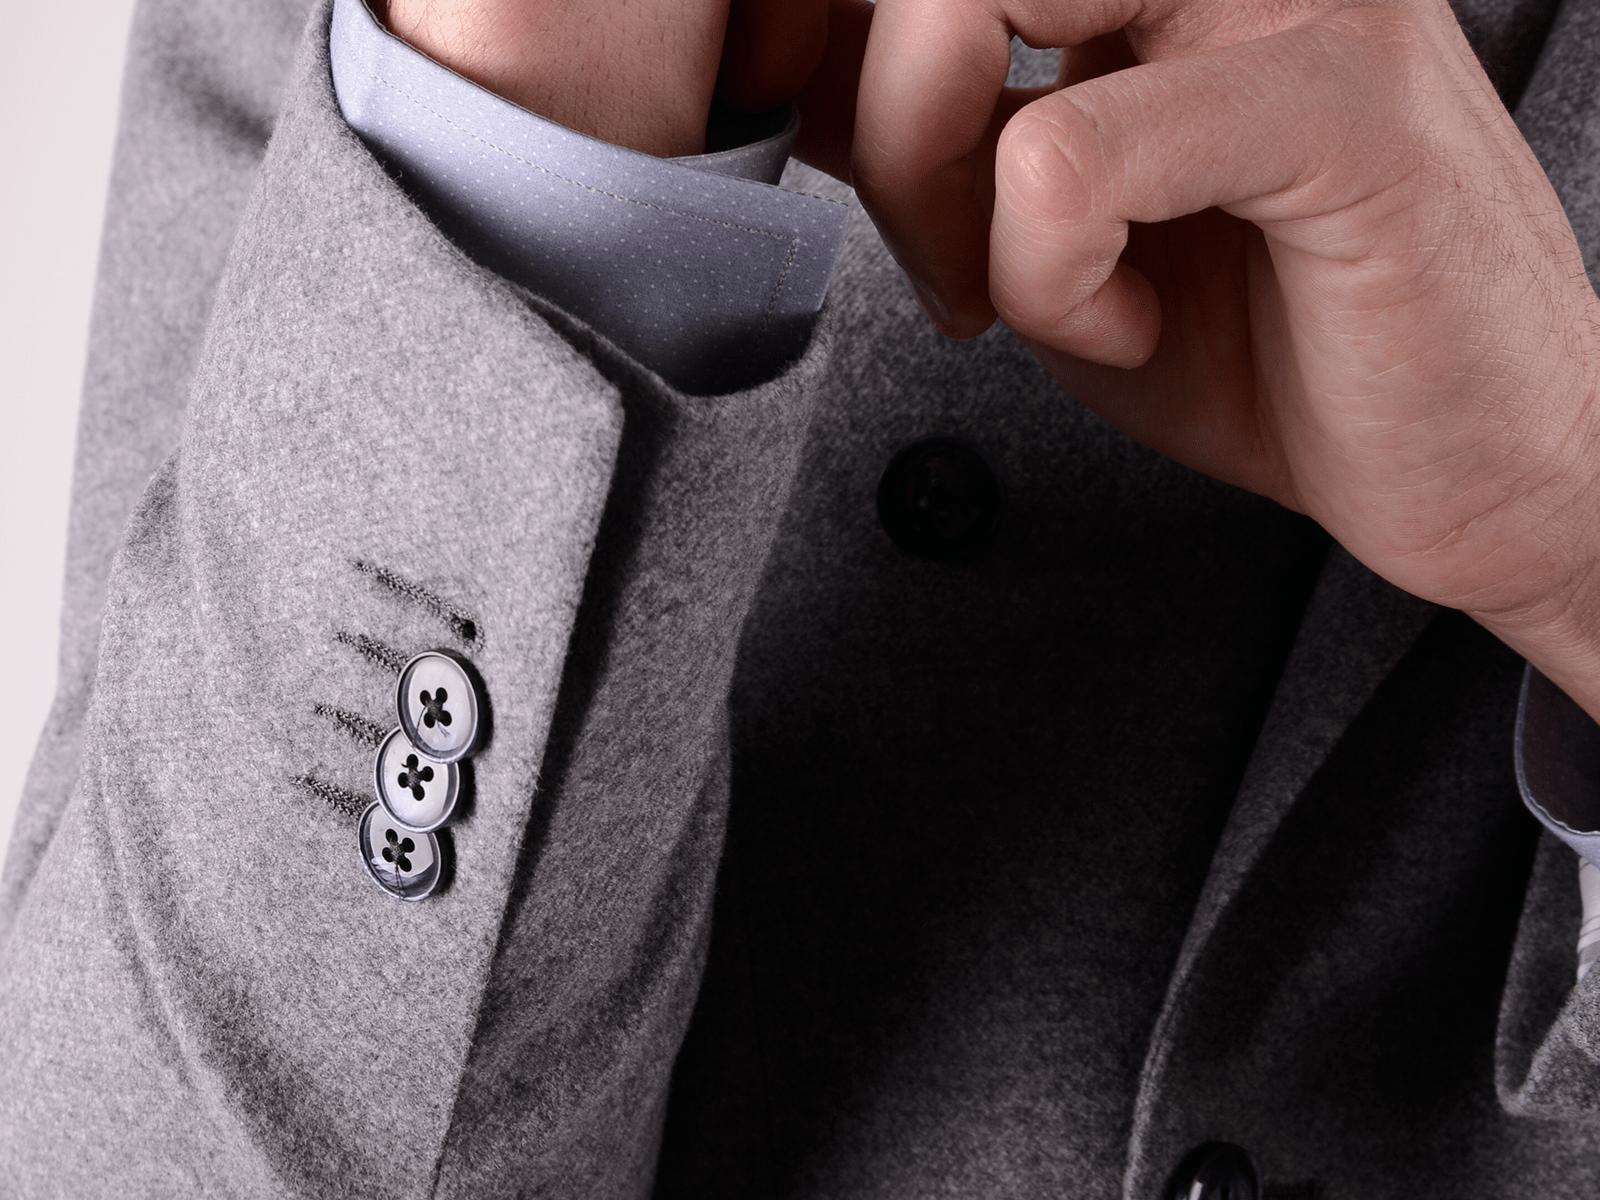 نتيجة بحث الصور عن Replace the suit sleeves